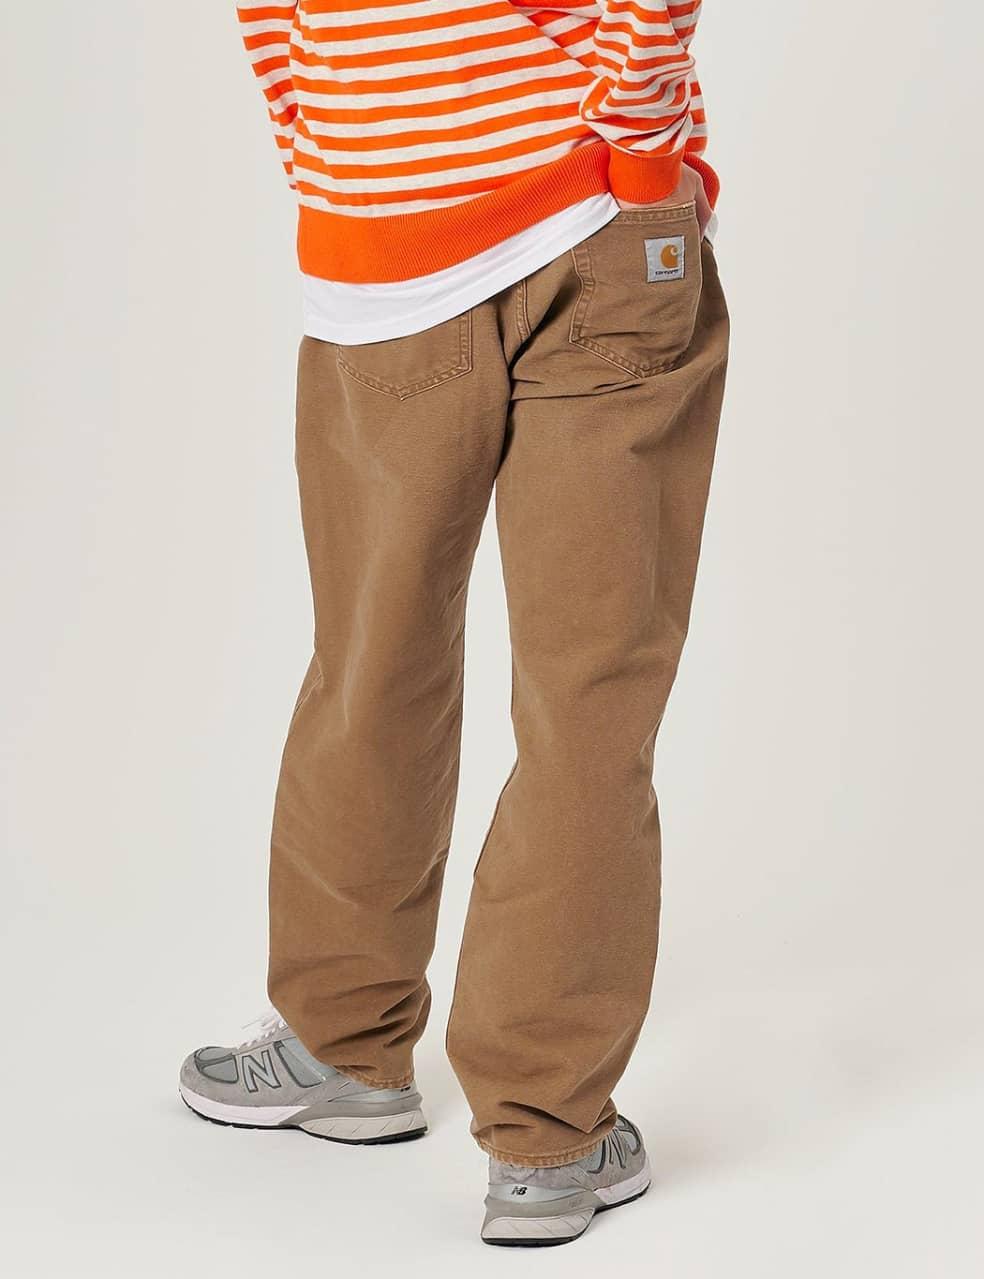 Carhartt-WIP Pontiac Pant - Hamilton Brown aged canvas | Trousers by Carhartt WIP 3